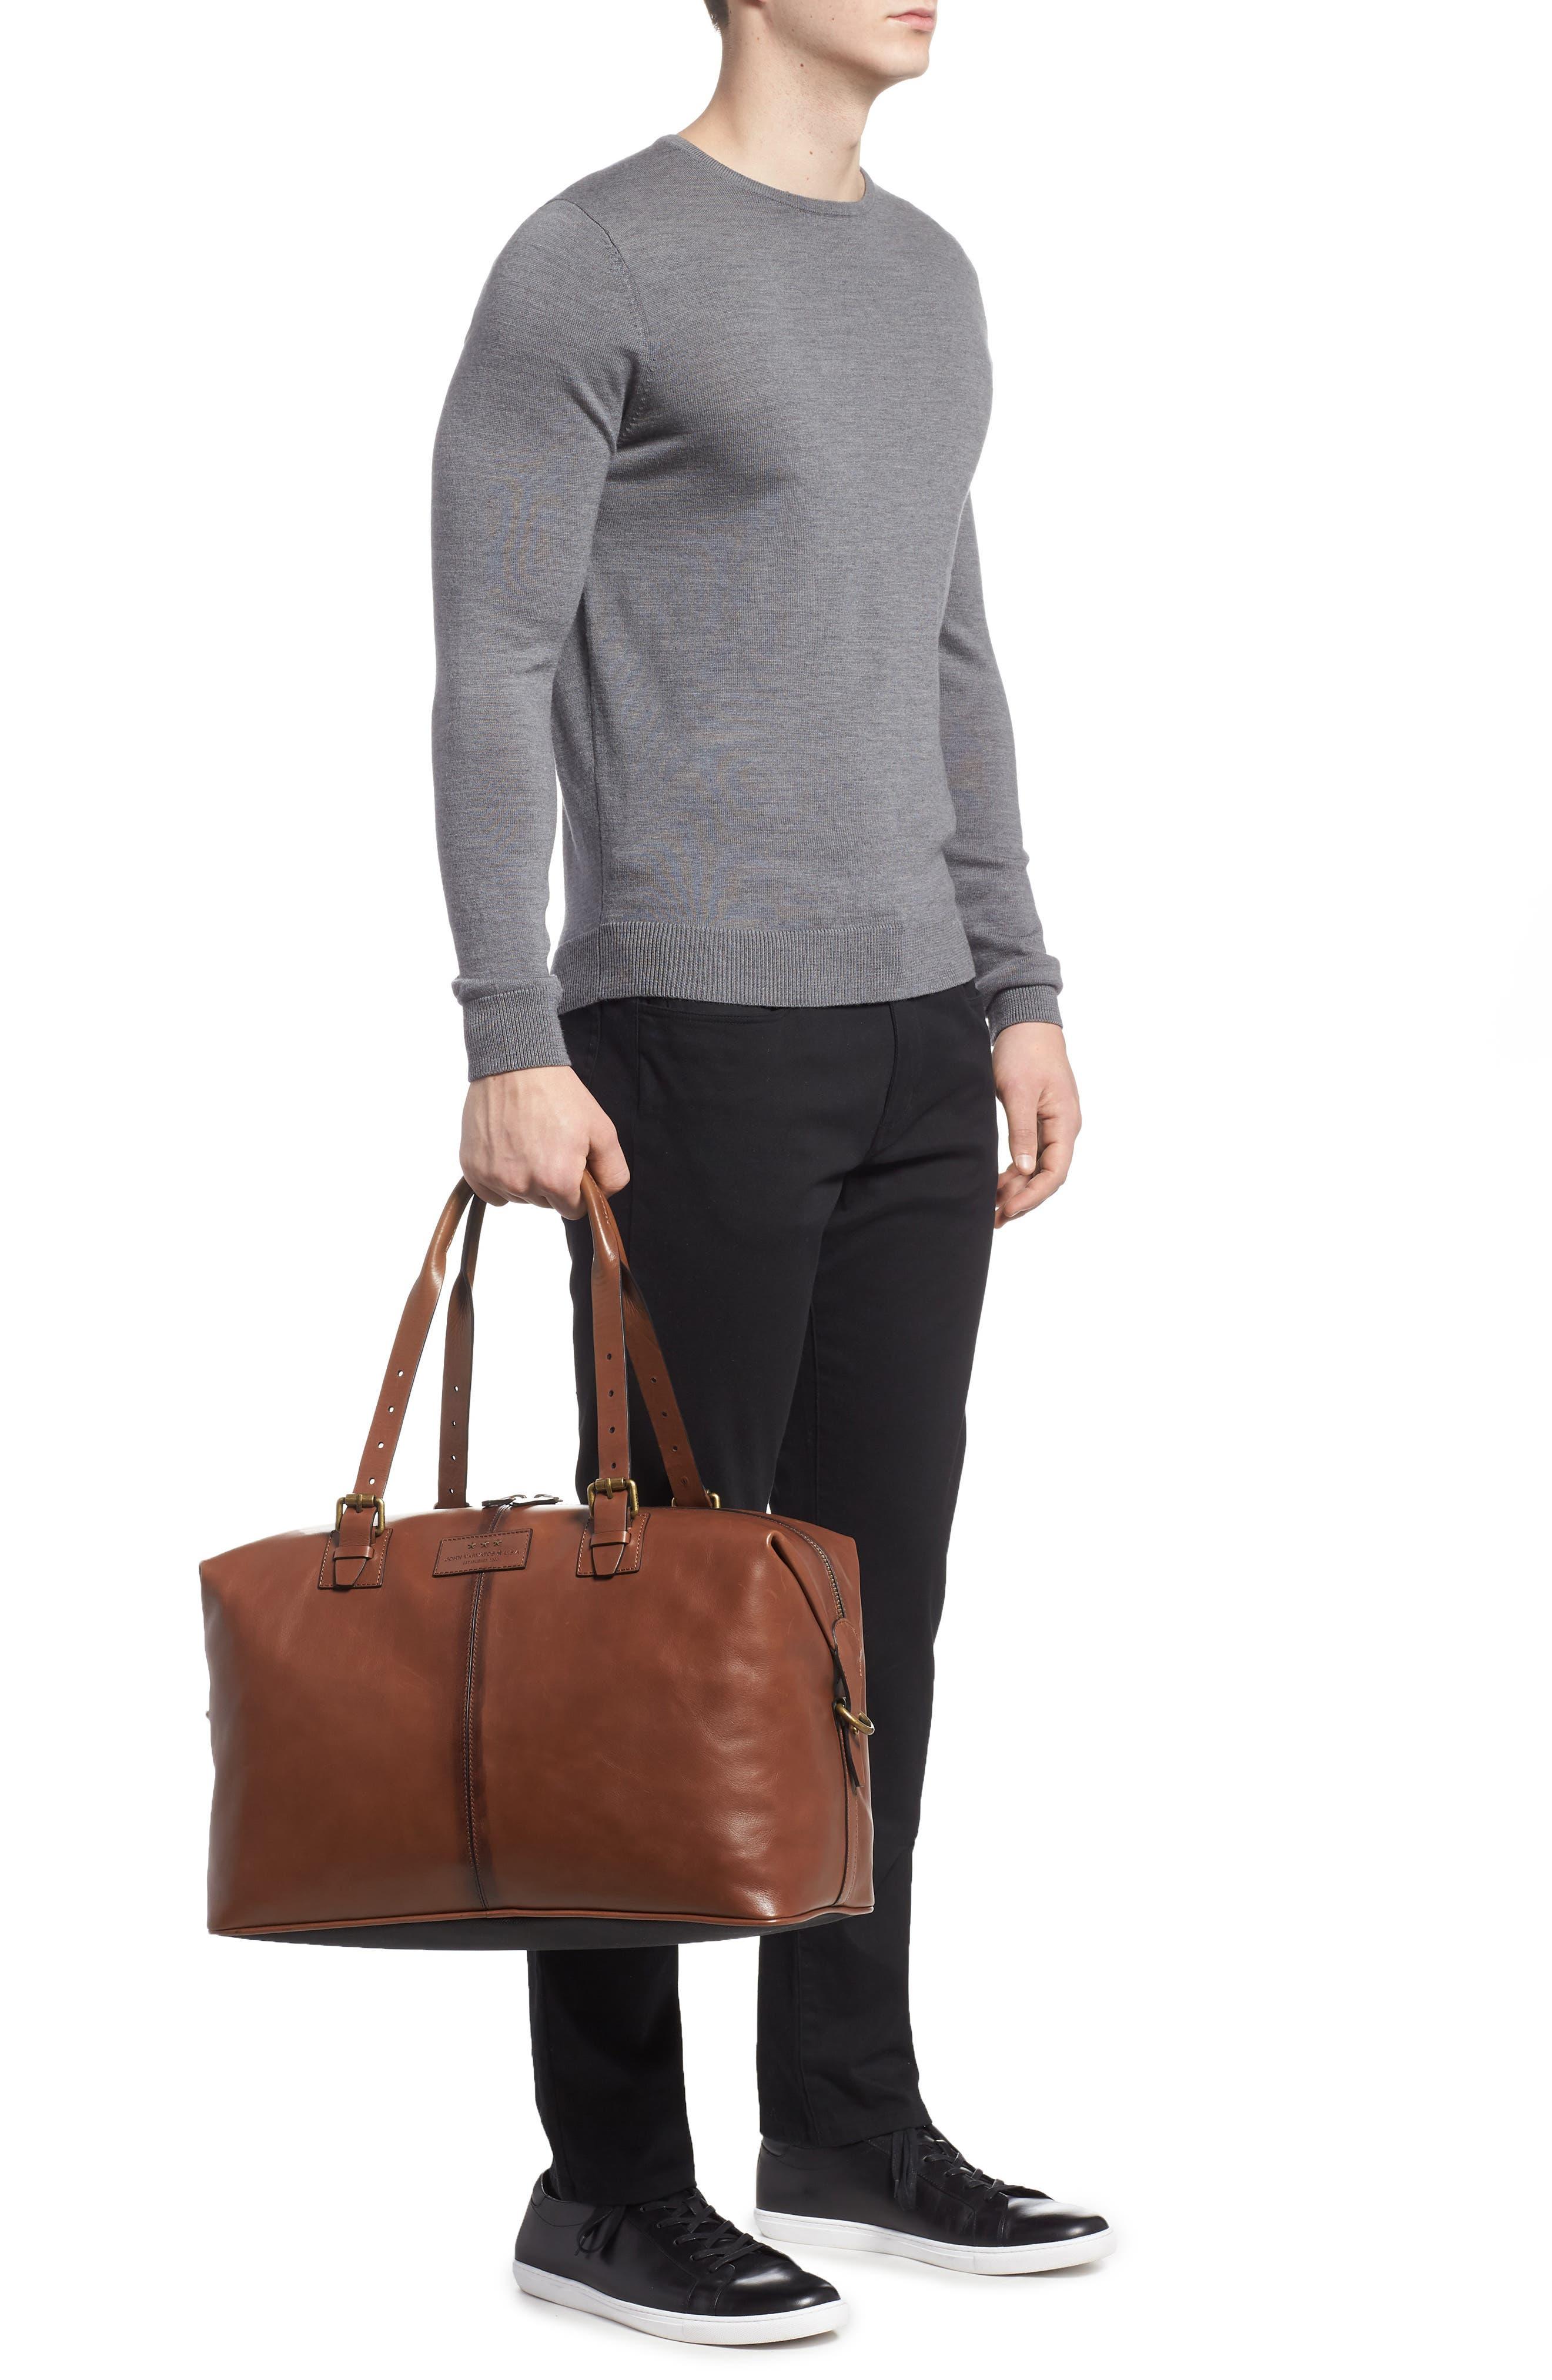 Heritage Leather Duffel Bag,                             Alternate thumbnail 2, color,                             200